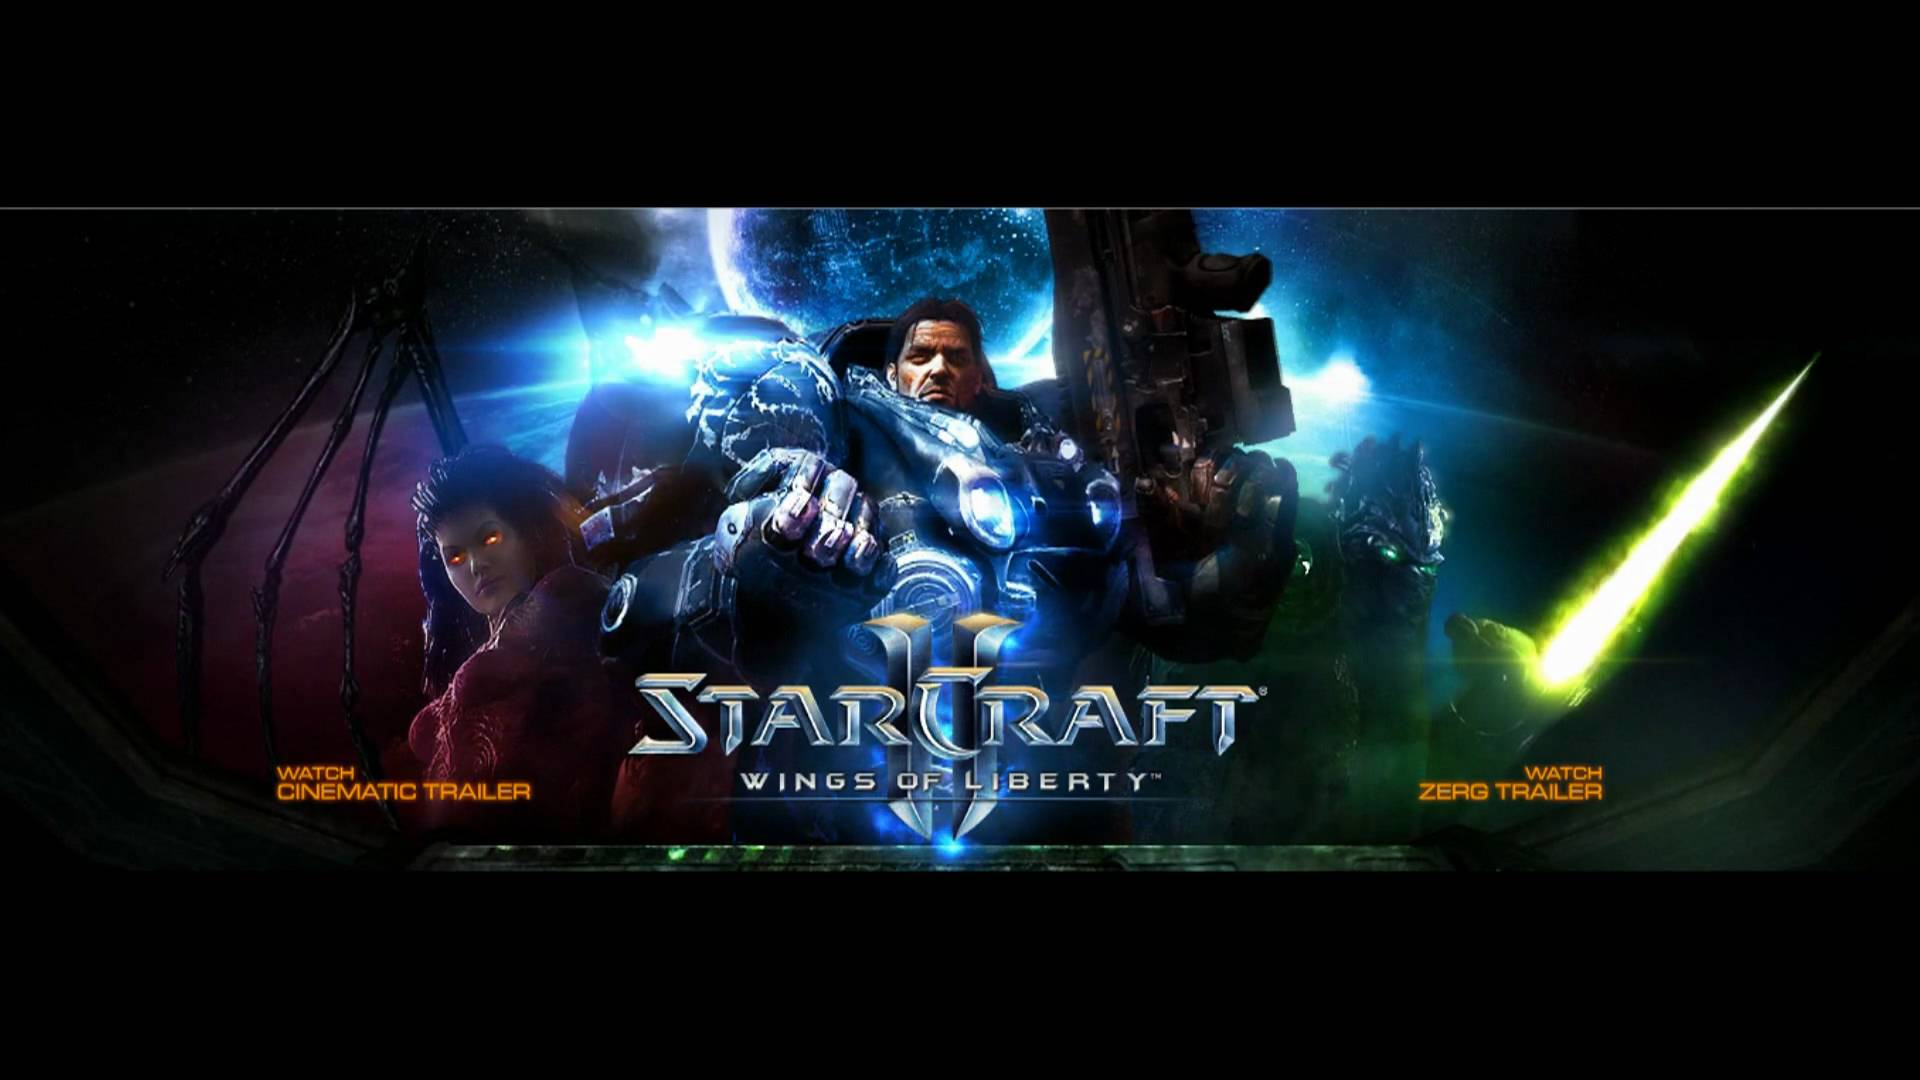 Starcraft 2 Wallpapers   Top Starcraft 2 Backgrounds 1920x1080